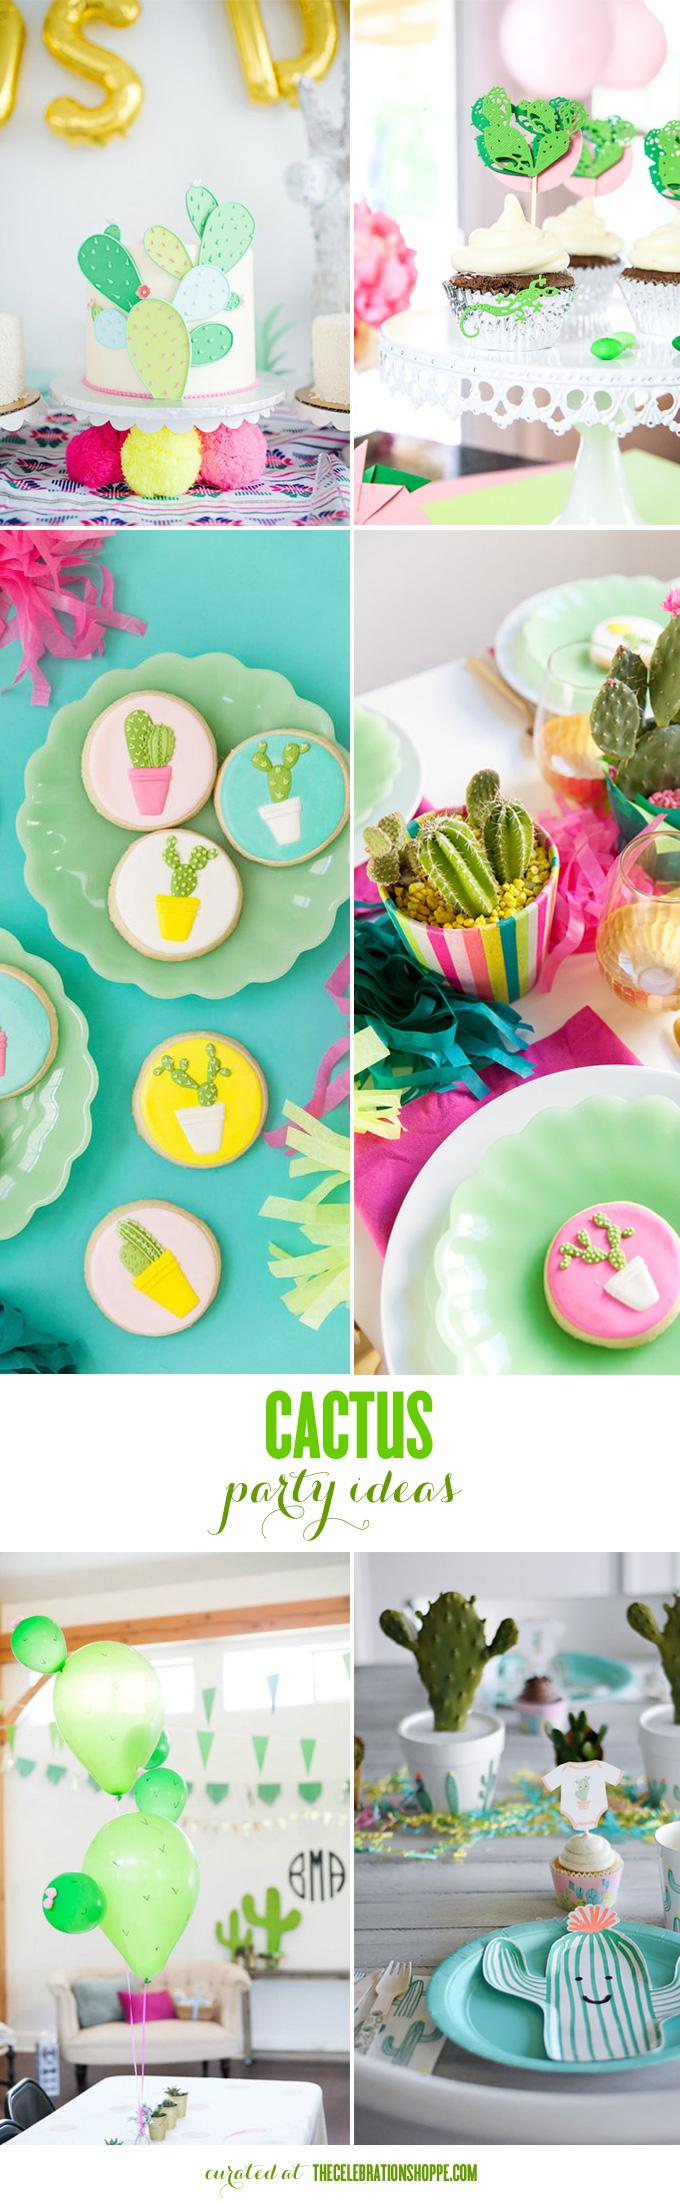 DIY Cactus Party   Kim Byers